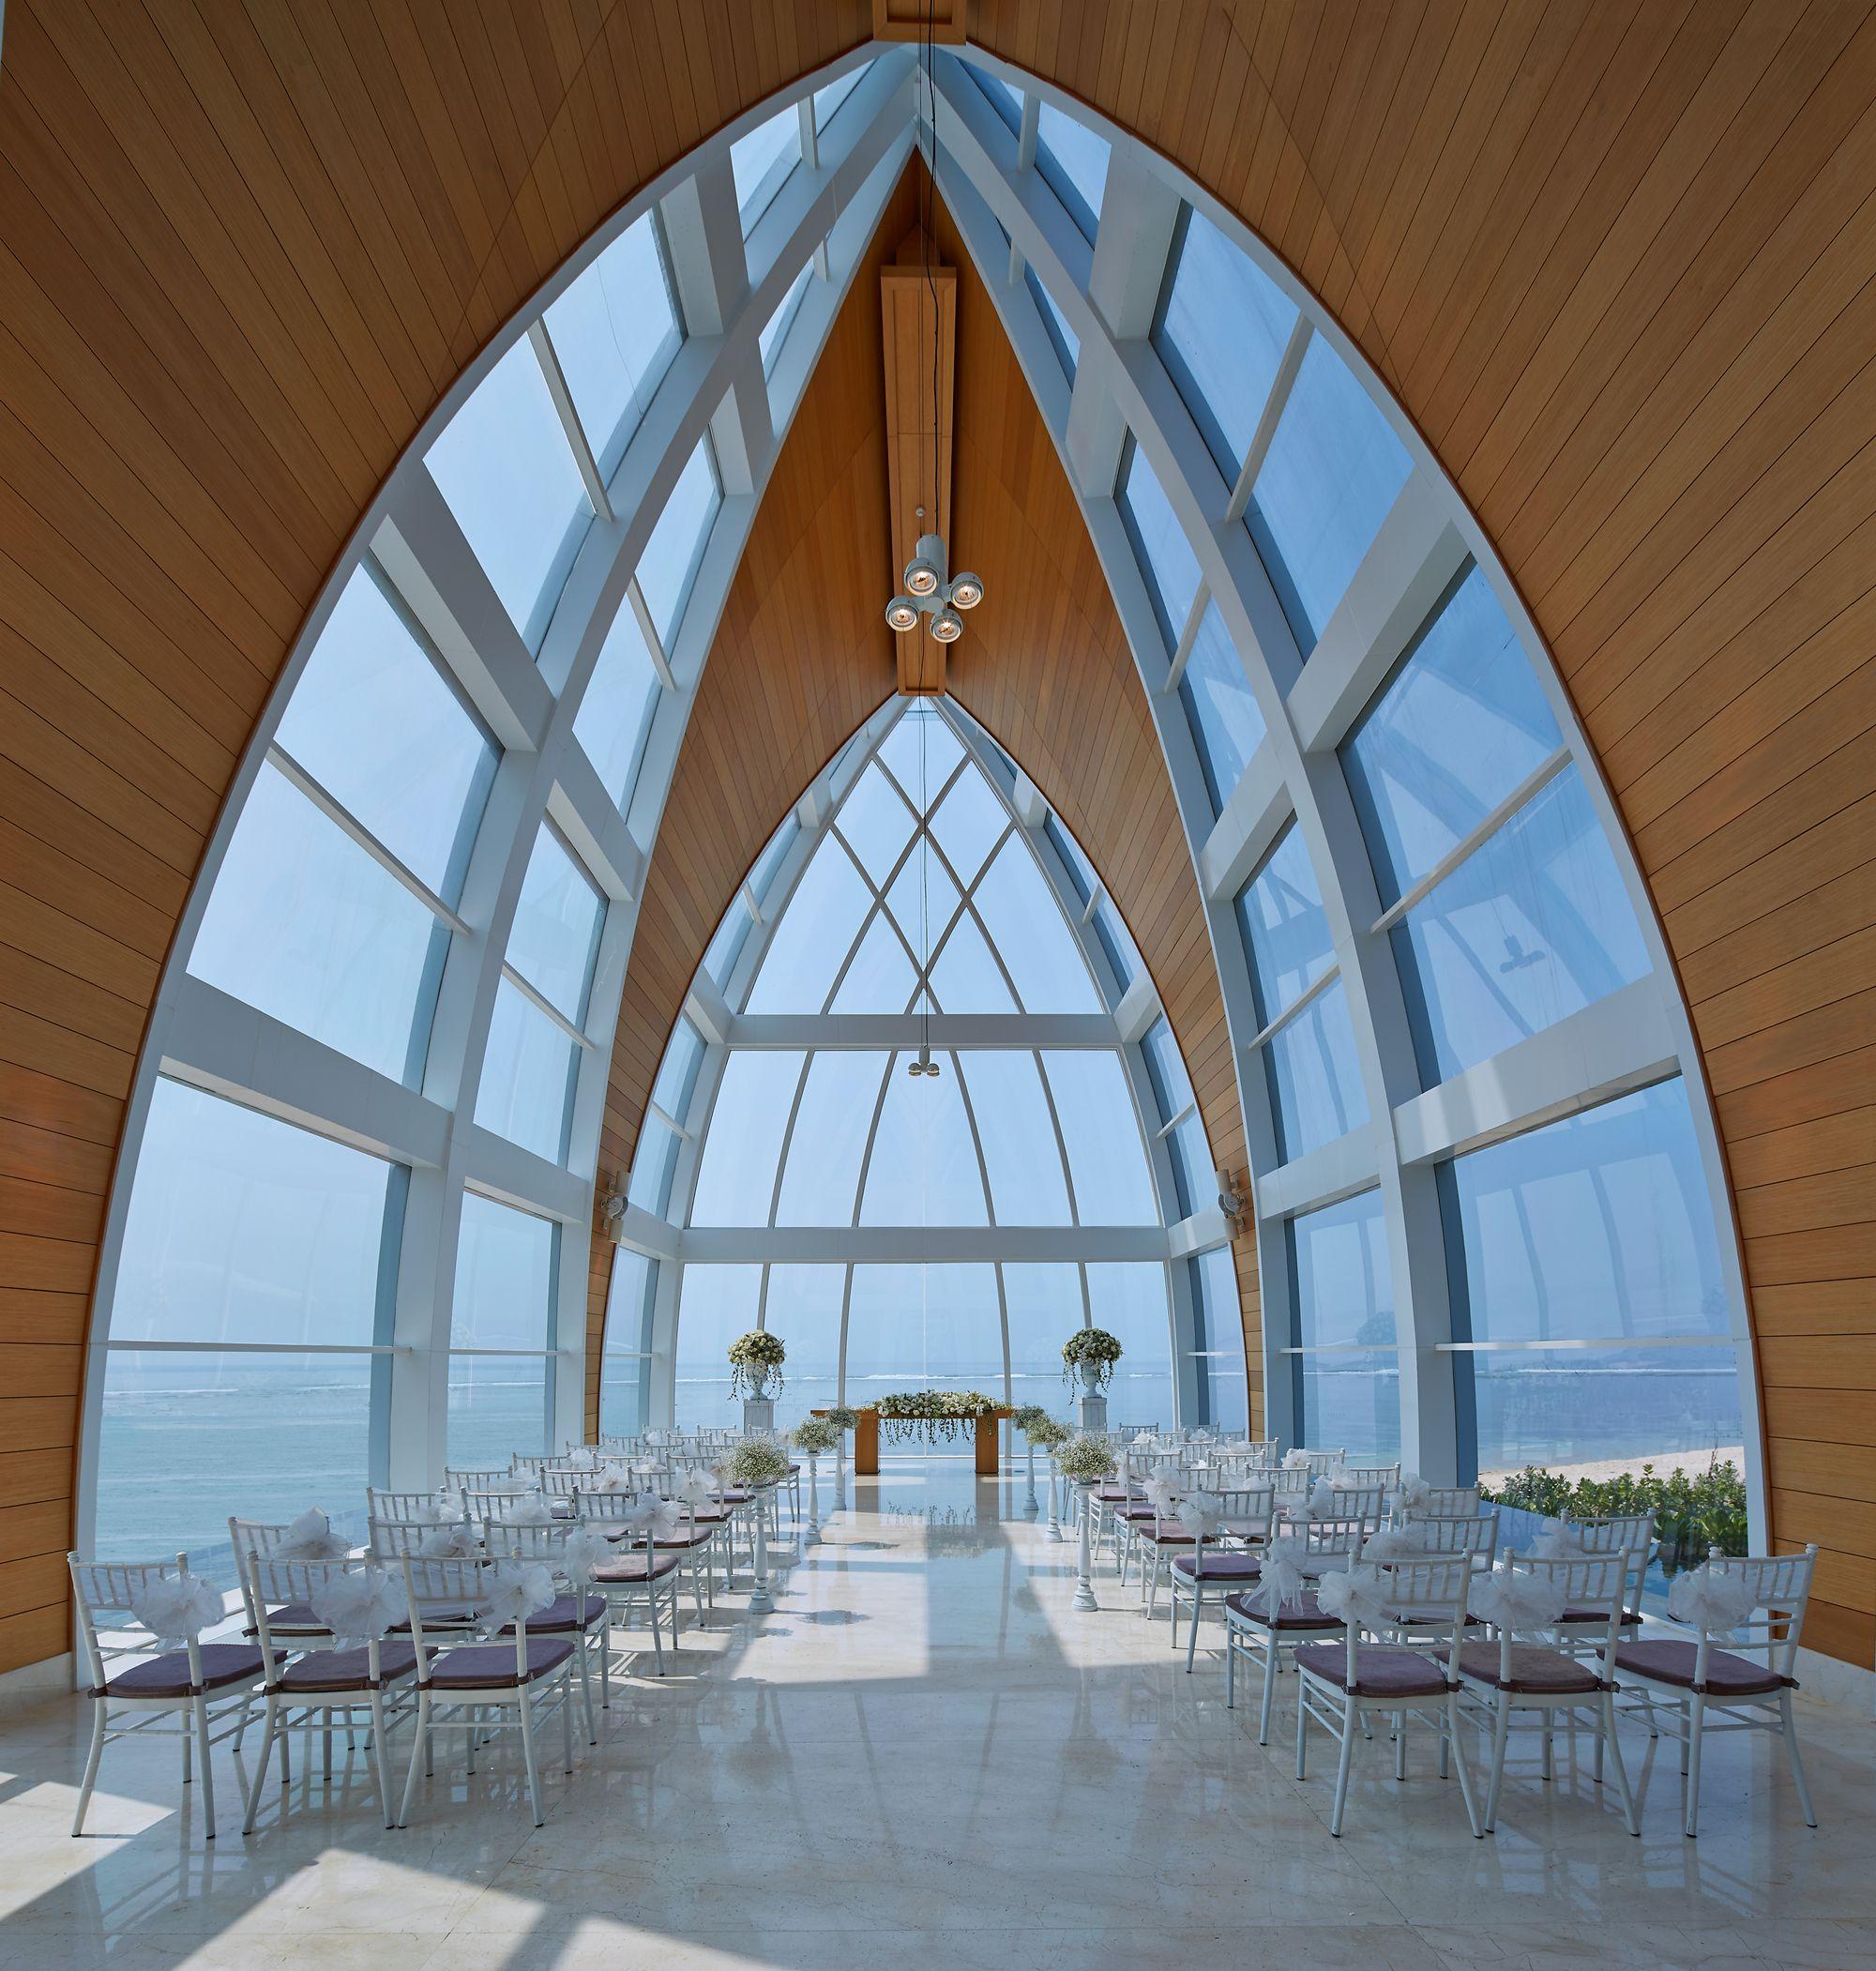 Bali Wedding Chapel Venues The Ritz Carlton Bali